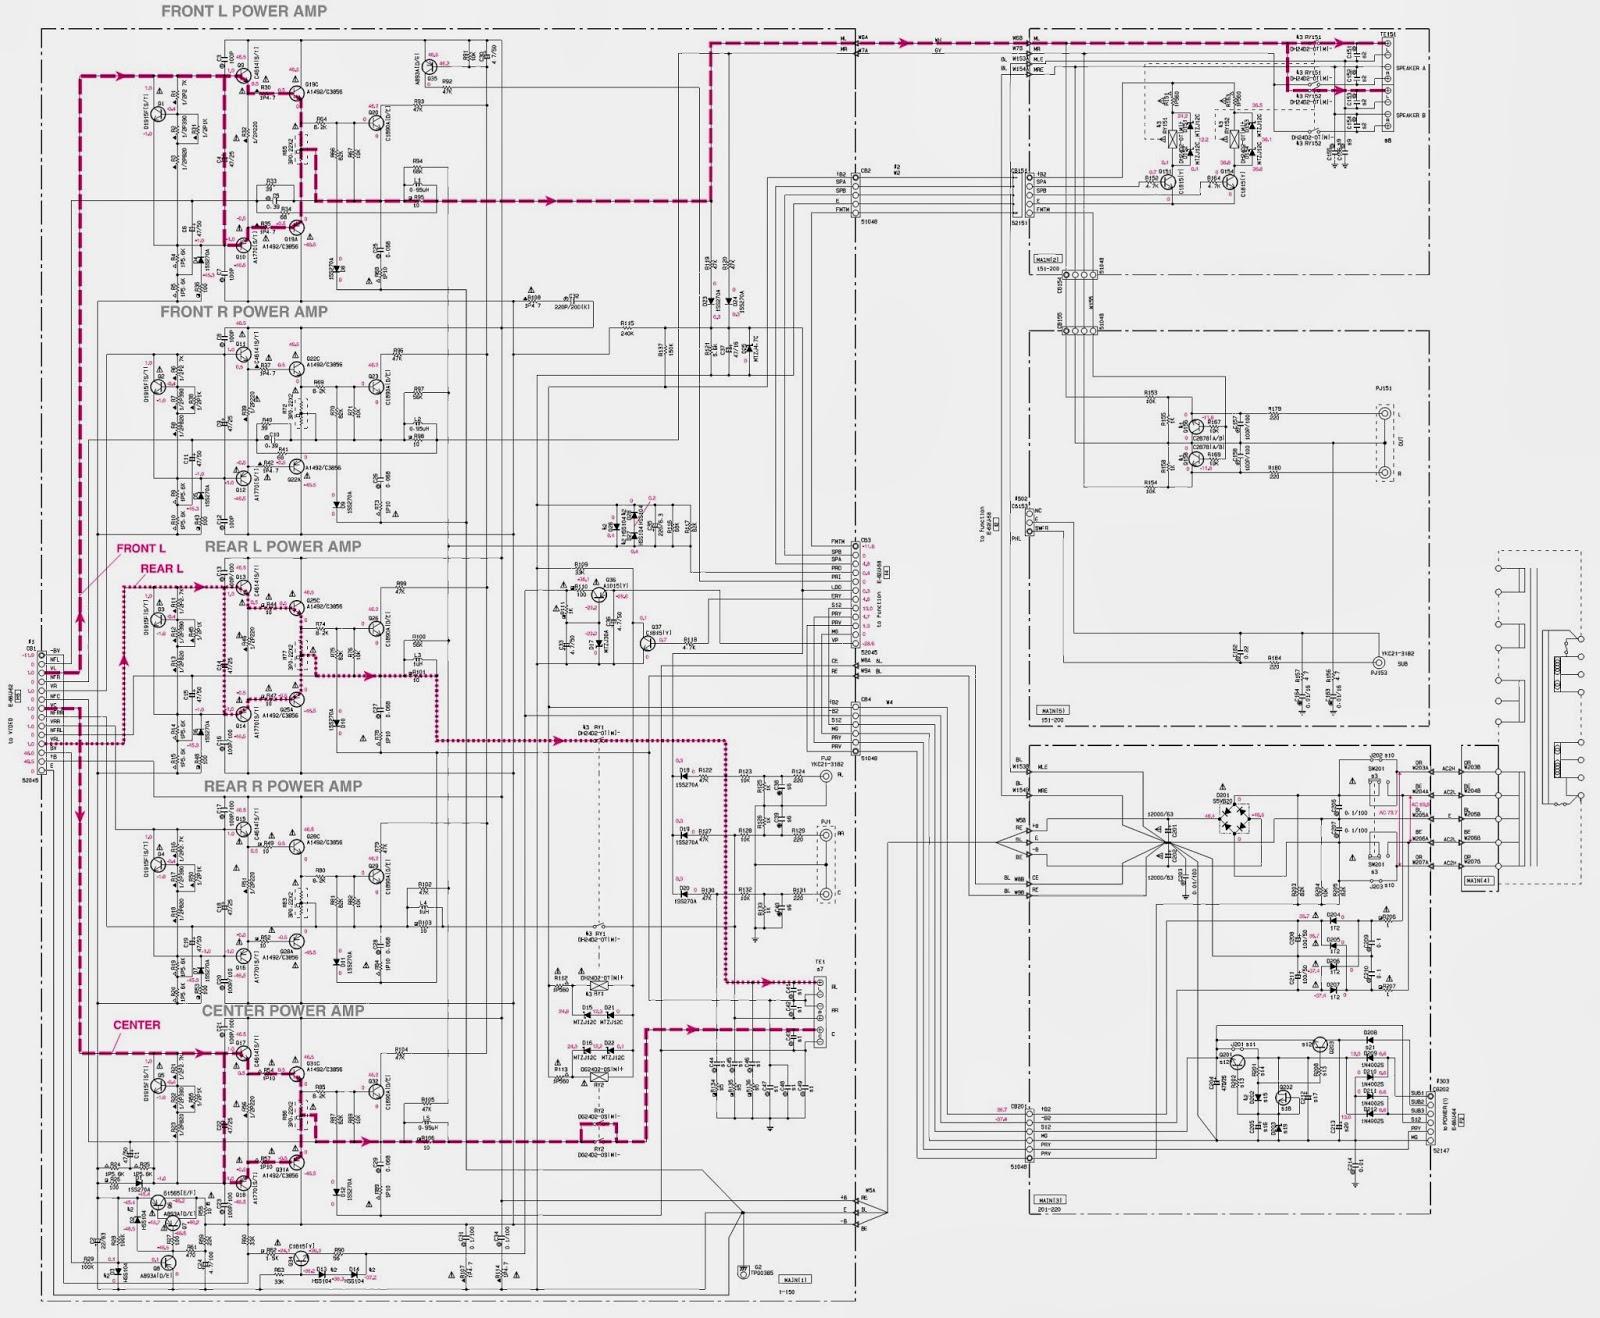 small resolution of yamaha rx v800 rx v800rds htr 5280 u2013 av receiver power amp schematicamp schematic circuit diagram